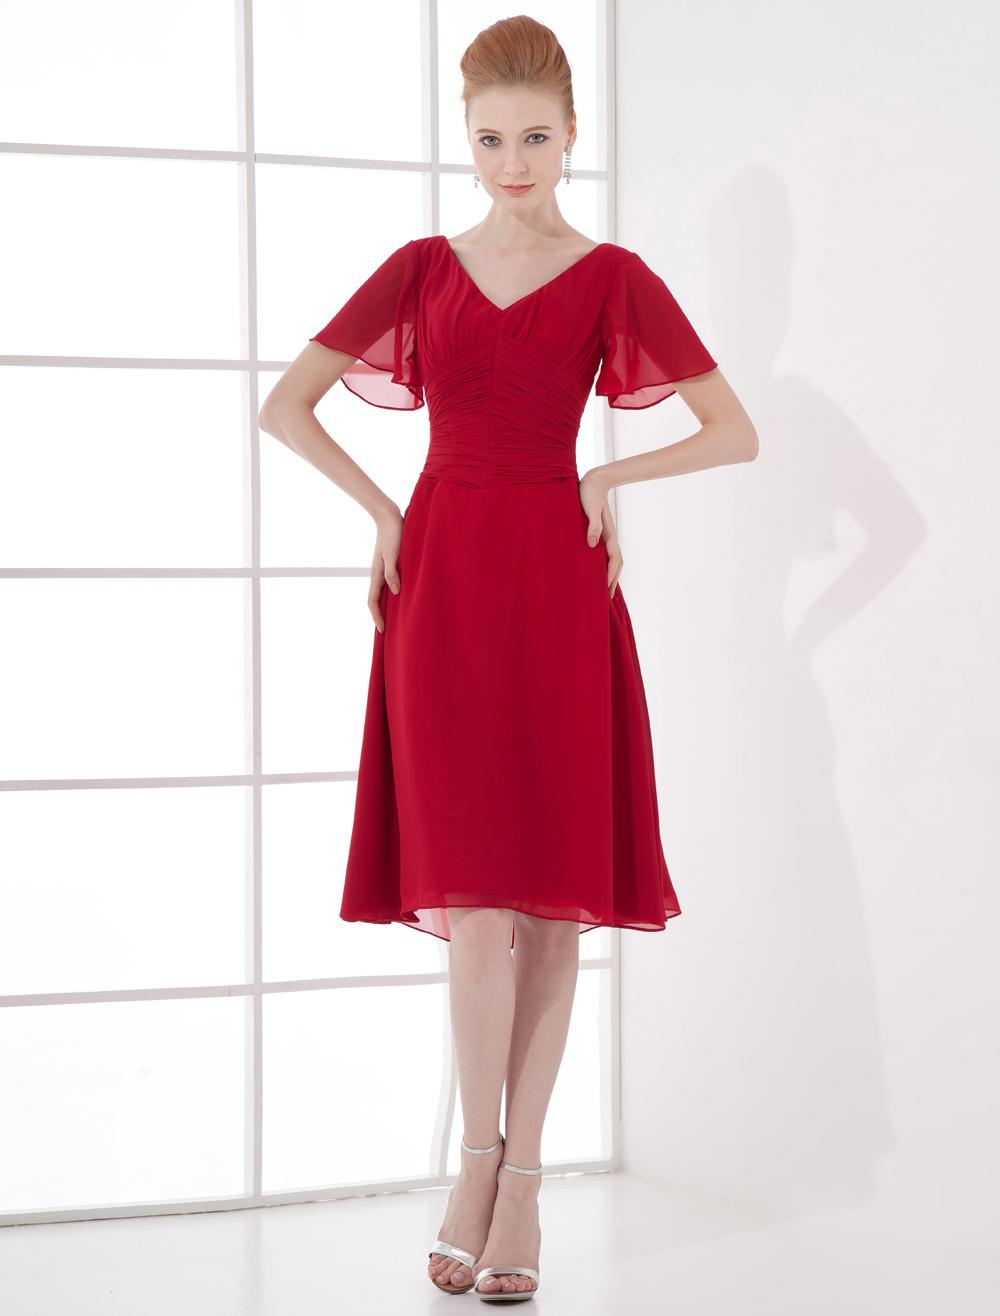 Burgundy Chiffon V-Neck Knee-Length Cocktail Dress  Wedding Guest Dress